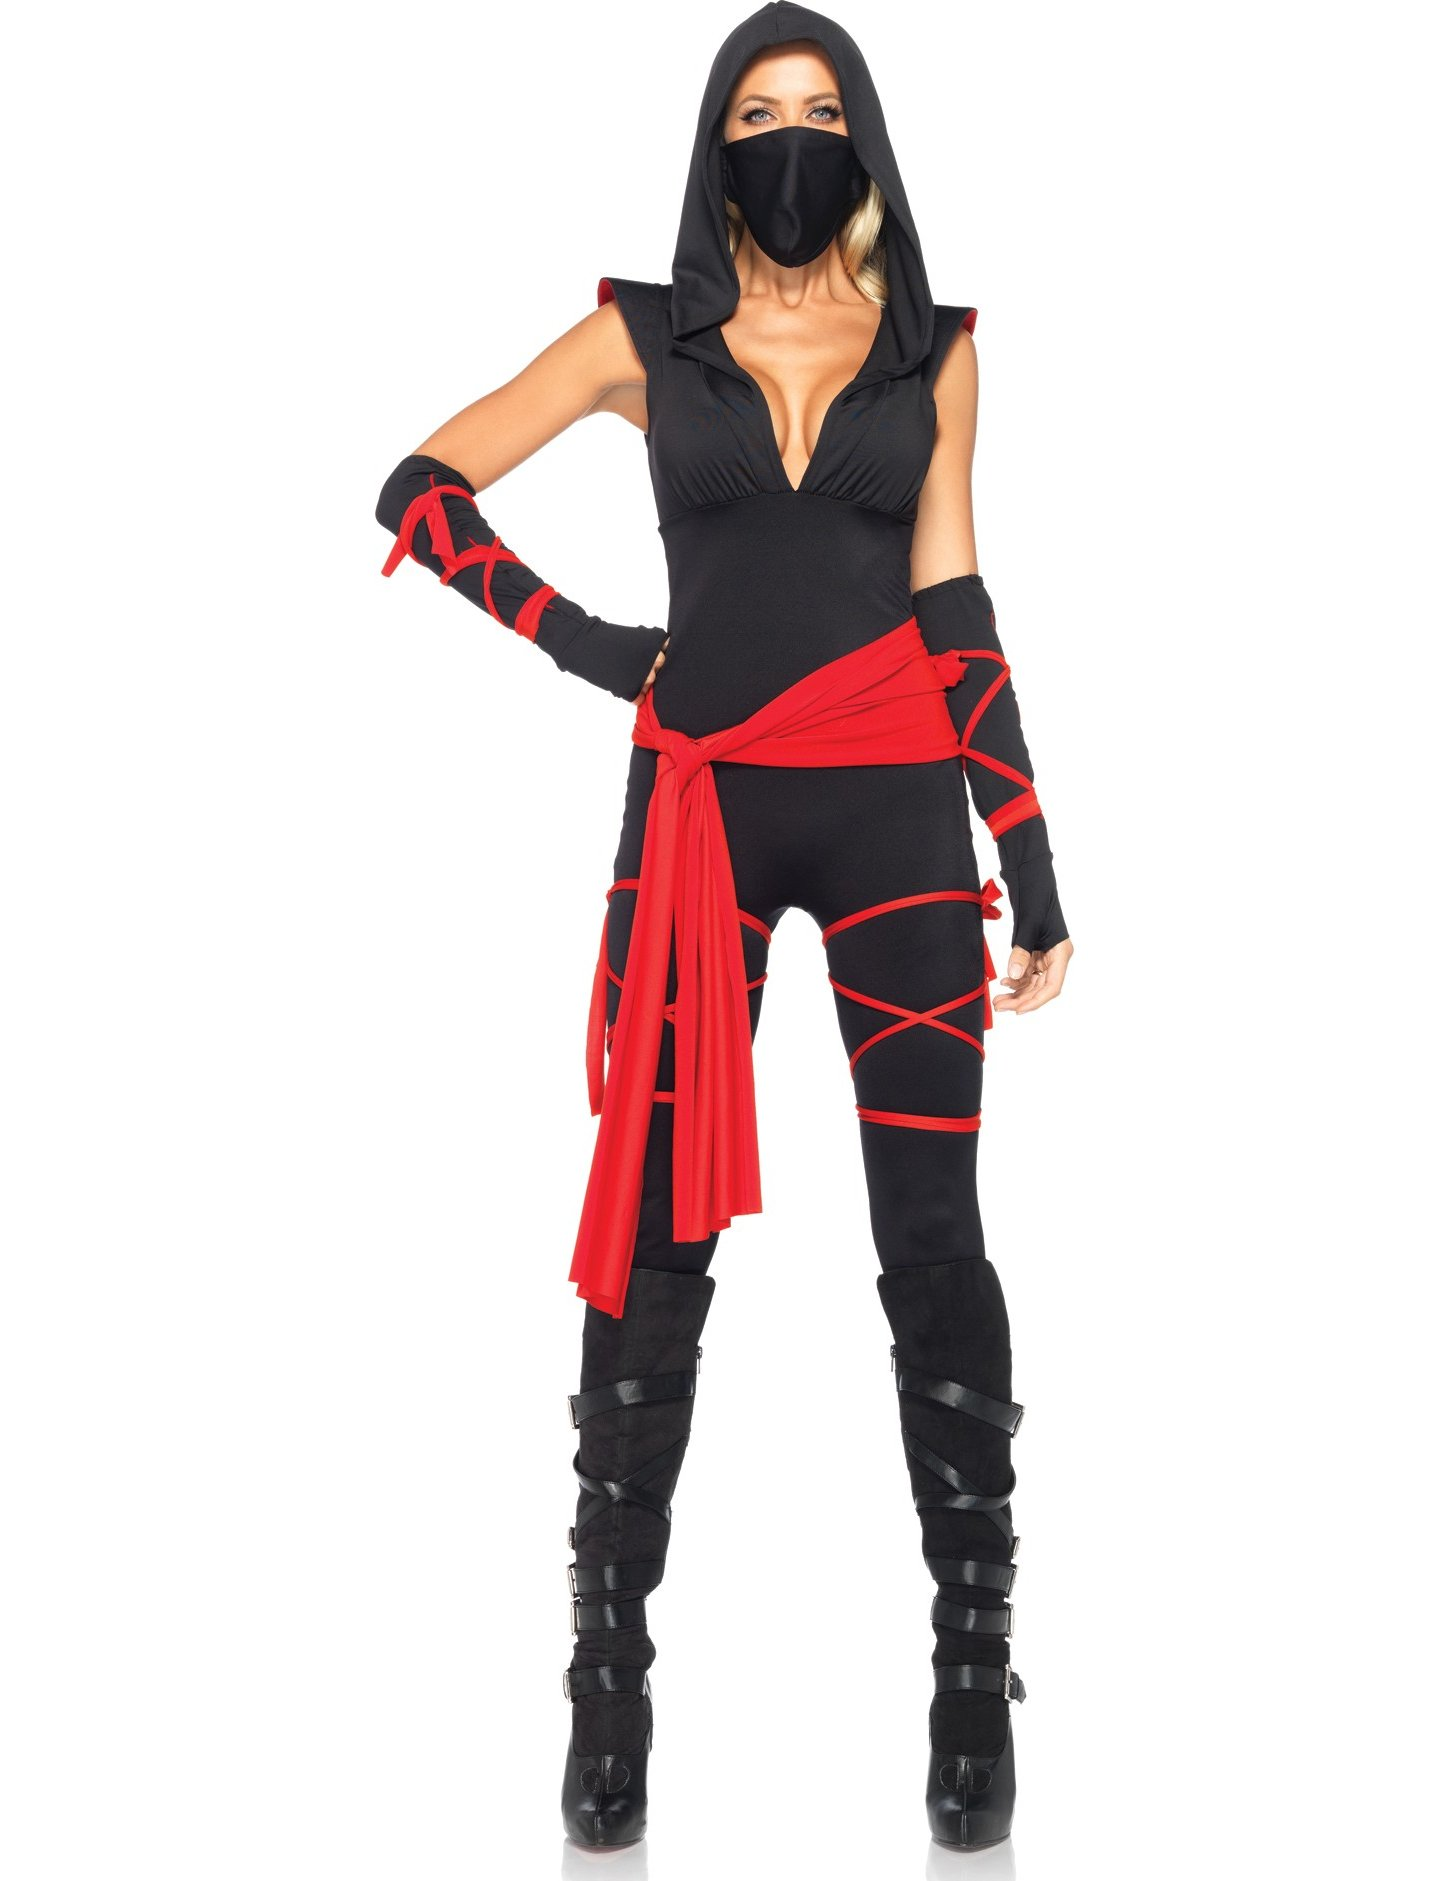 maquillage femme ninja